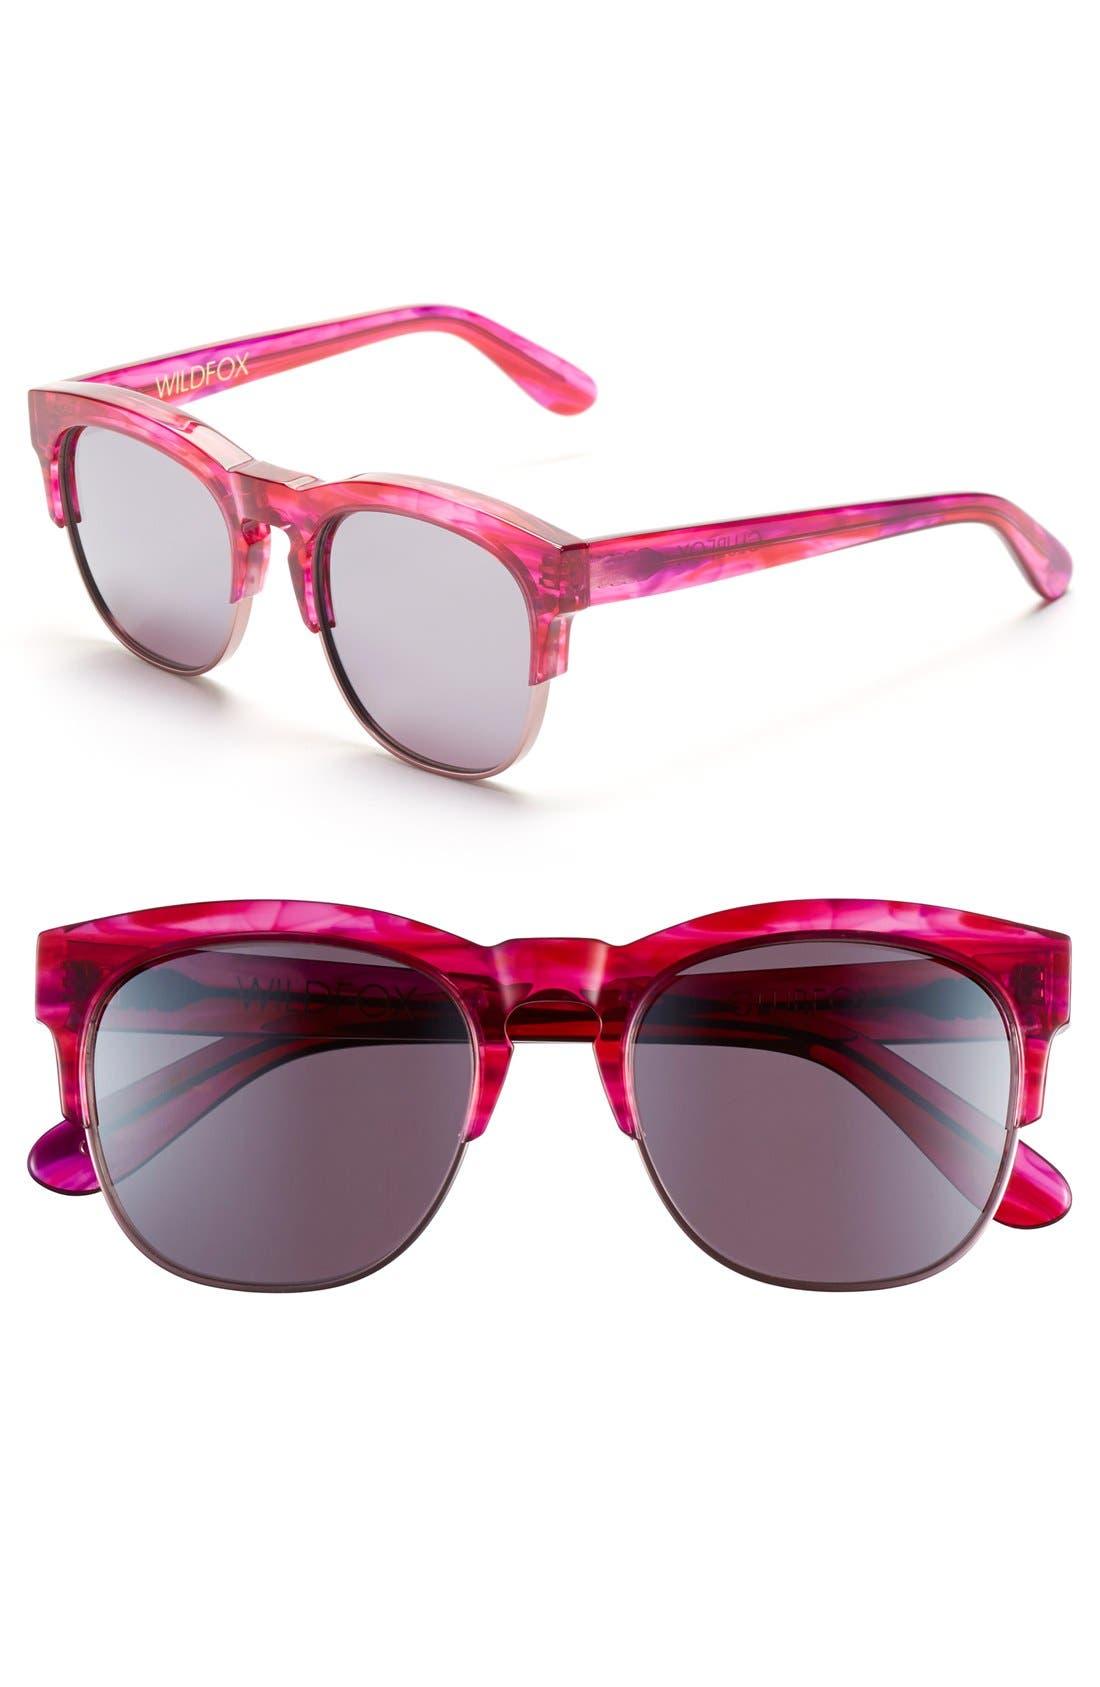 Main Image - Wildfox 'Club Fox Deluxe' 52mm Sunglasses